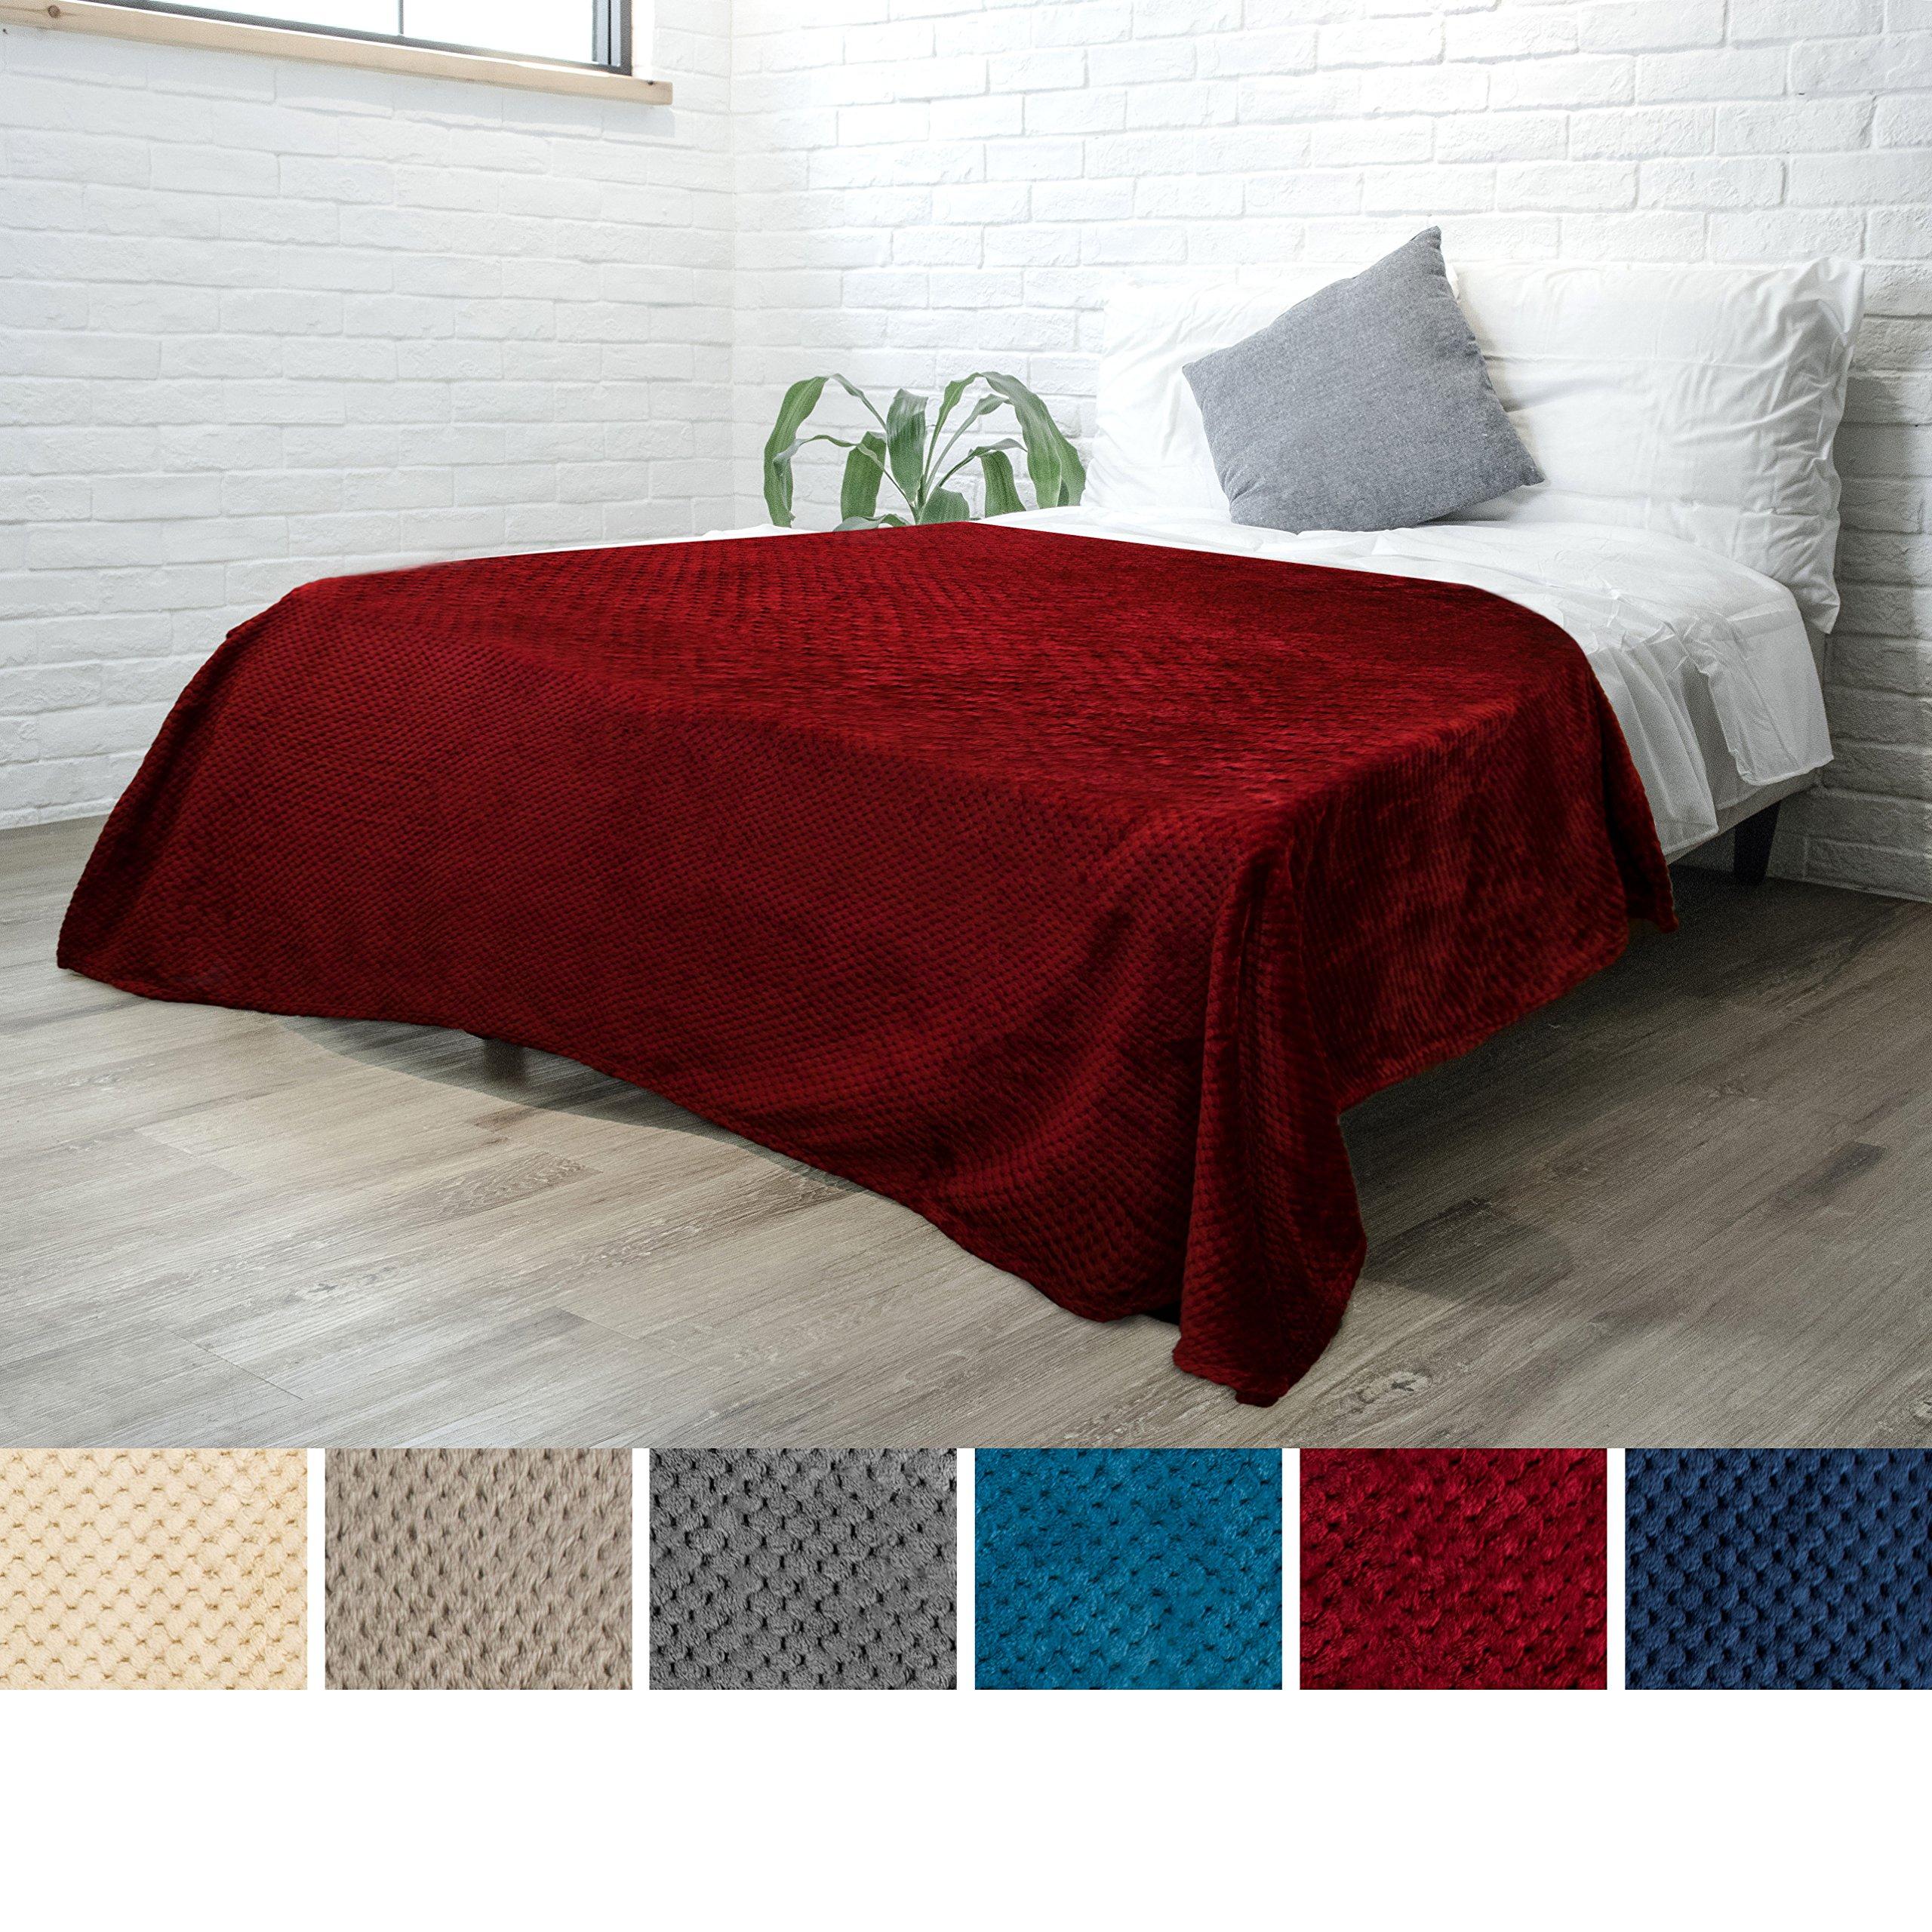 PAVILIA Premium Flannel Fleece Bed Throw Blanket for Sofa Couch | Wine Waffle Textured Soft Fuzzy Blanket | Warm Cozy Microfiber Plush | Twin Size 60 x 80 | Lightweight, All Season